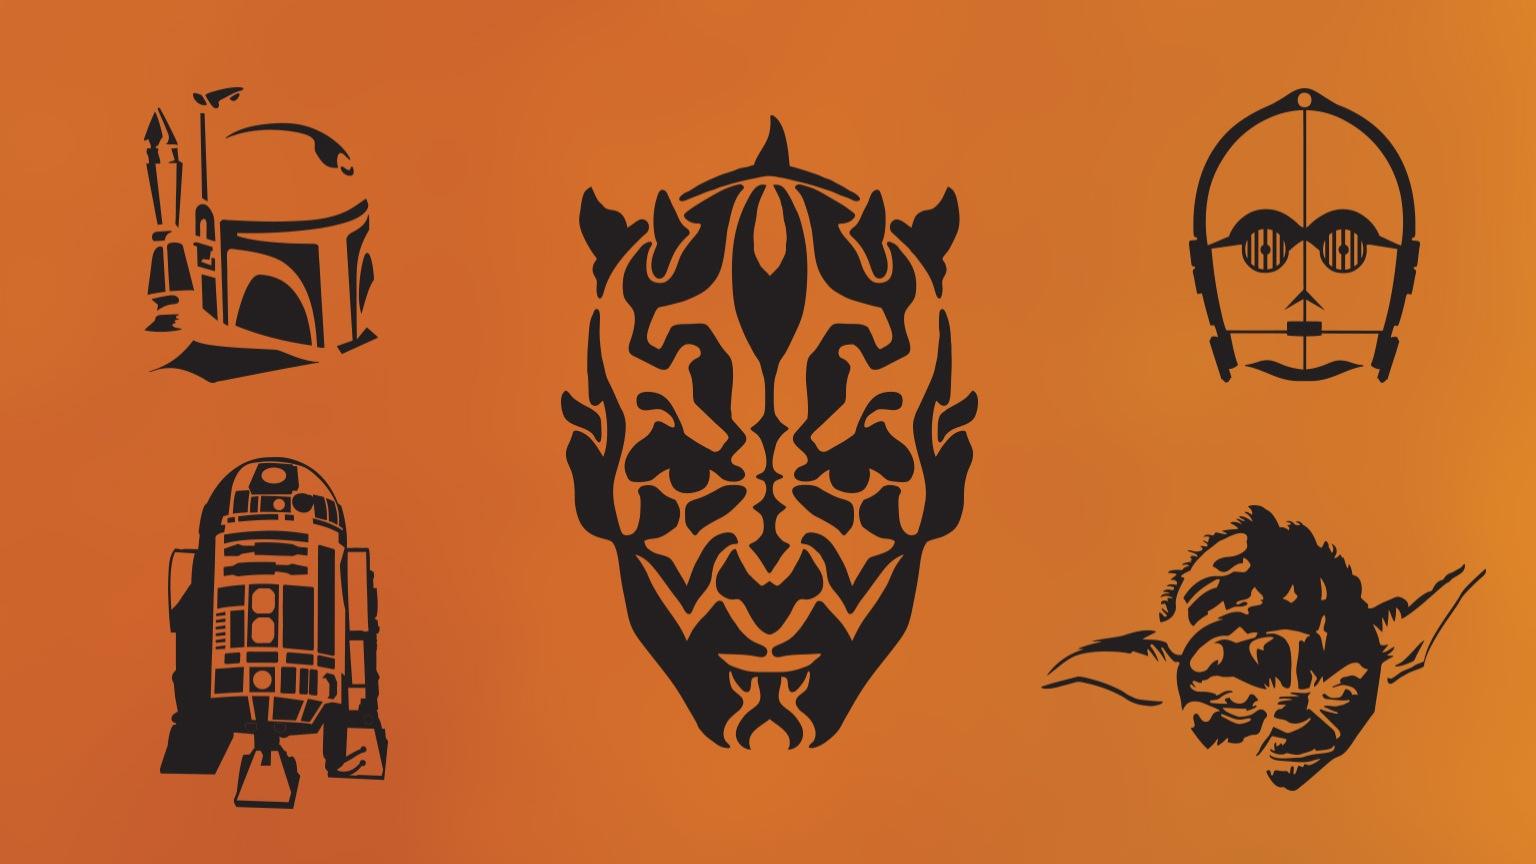 Diy Star Wars Pumpkin Stencils   Starwars - Star Wars Pumpkin Stencils Free Printable